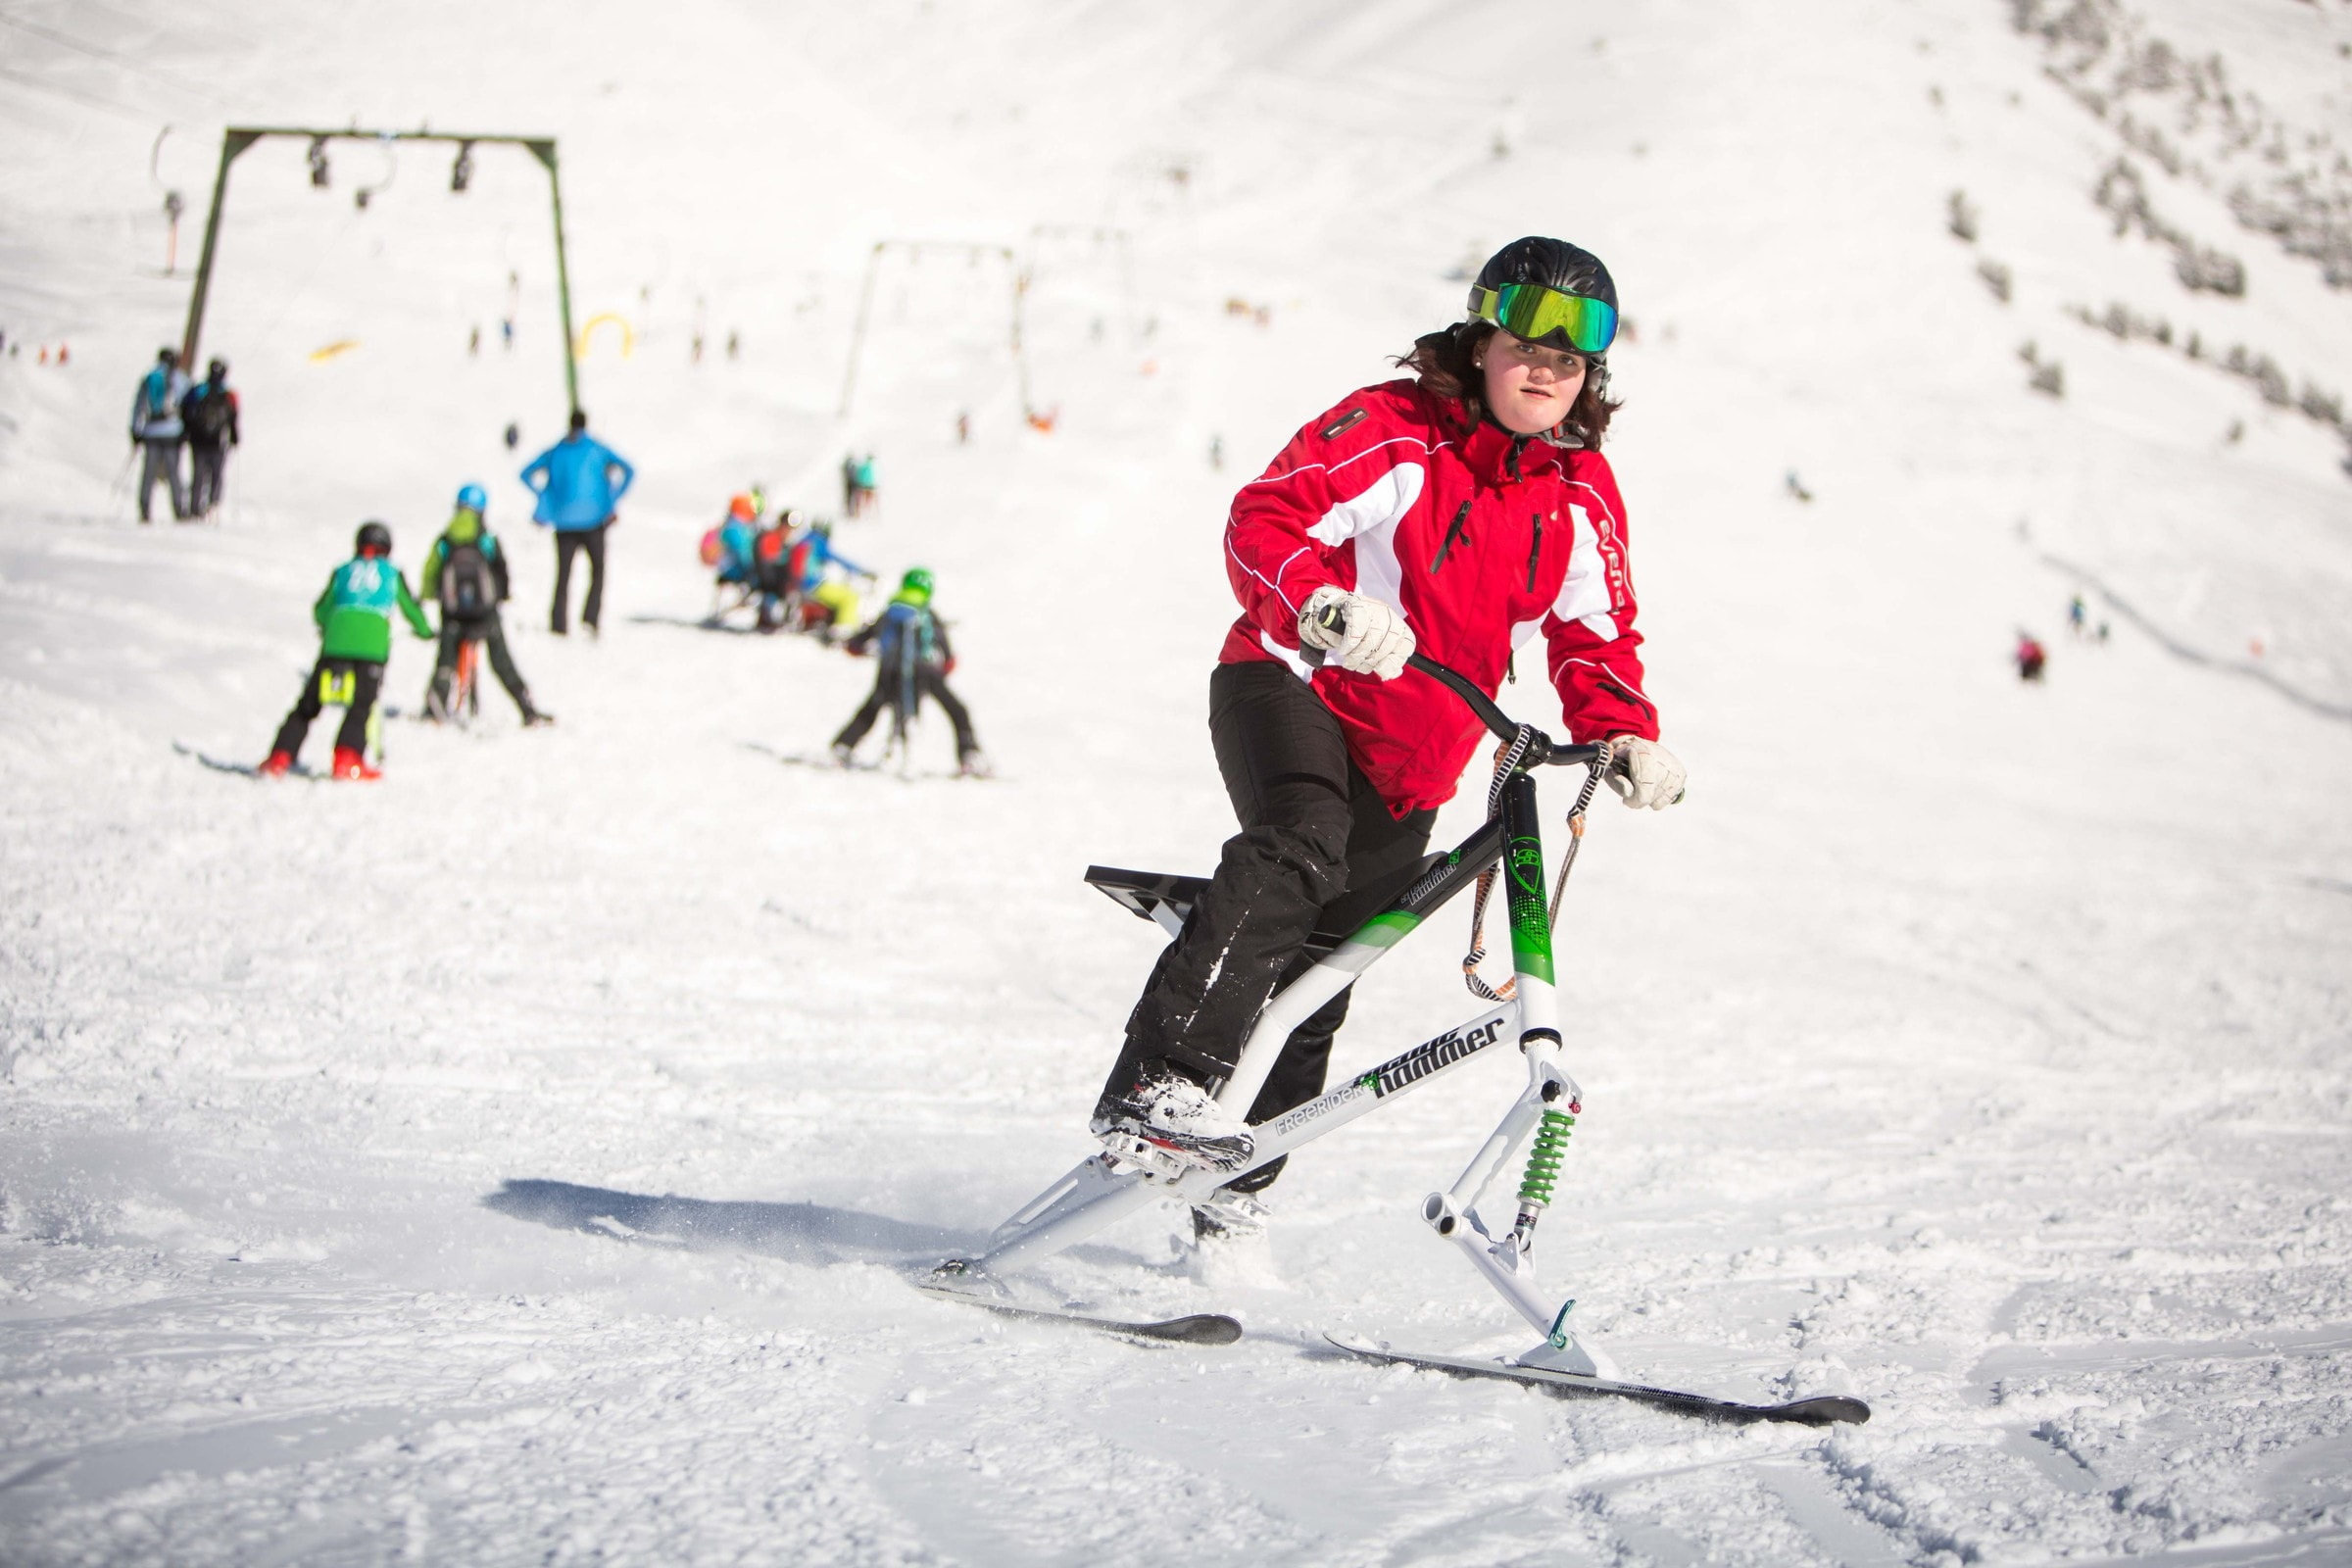 Barrierefreies Skifahren, Wiffzack, Mogasi, Alpengaudi